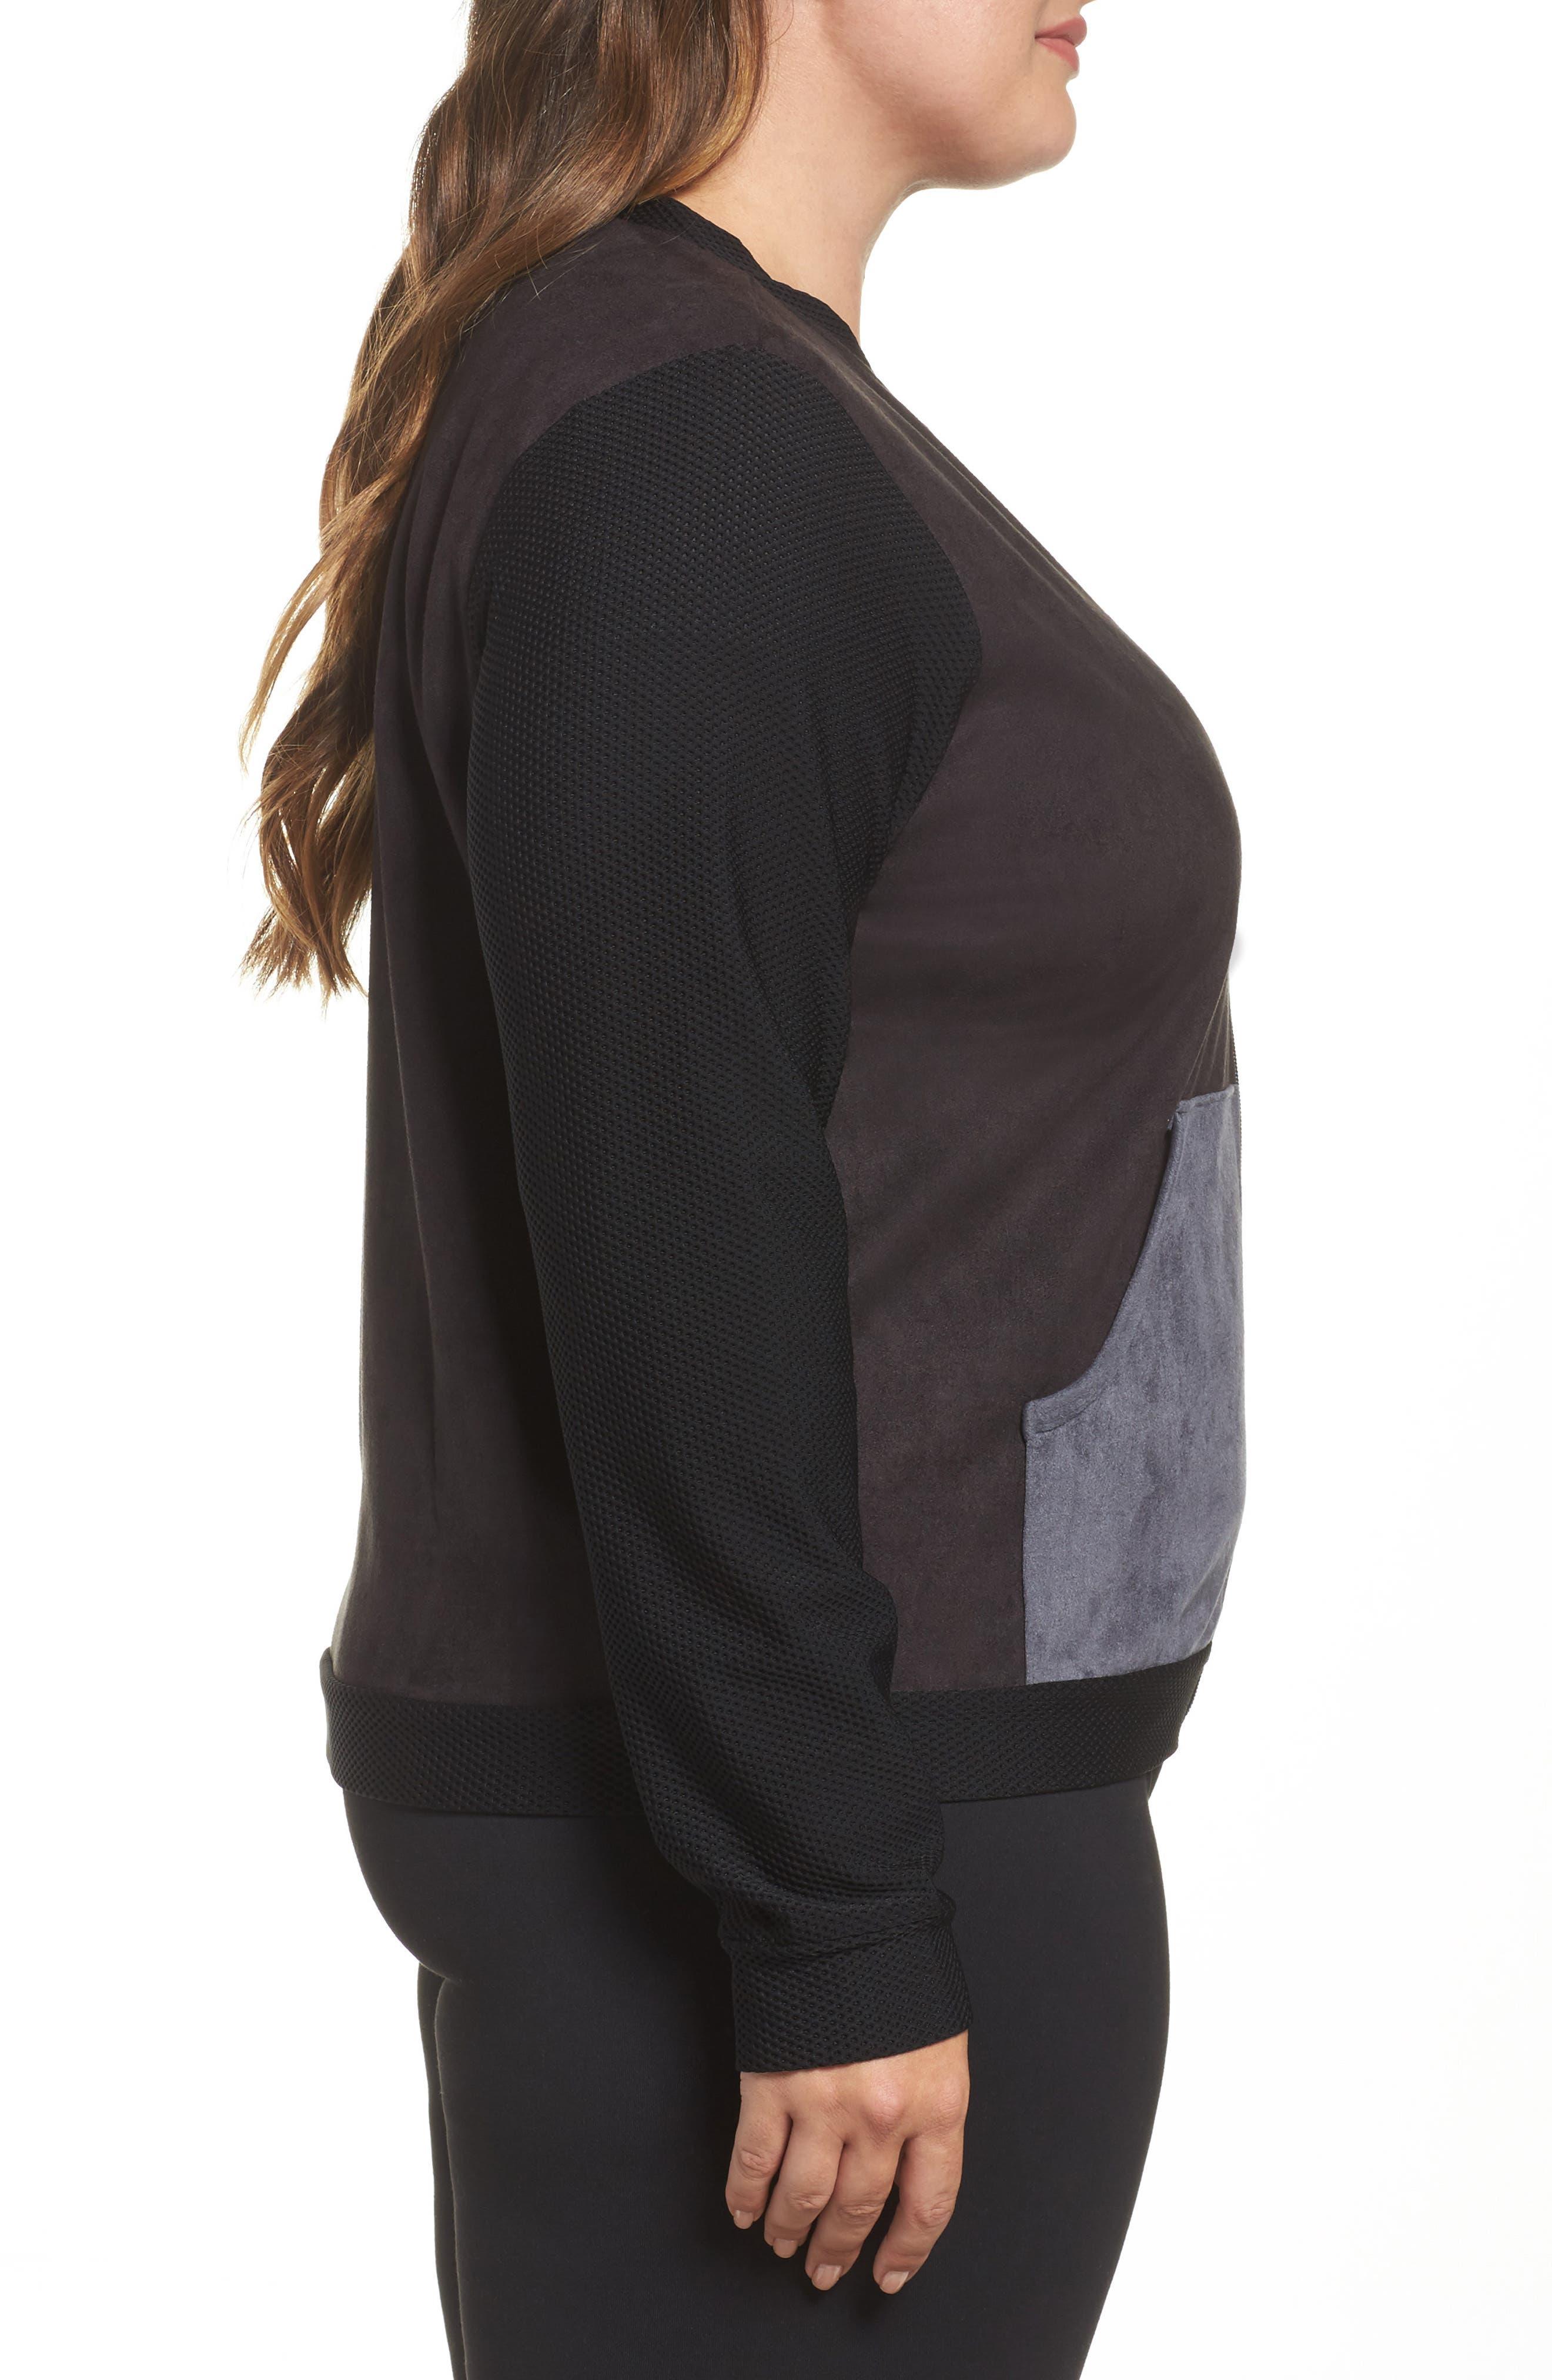 Track Jacket,                             Alternate thumbnail 4, color,                             Black/ Charcoal